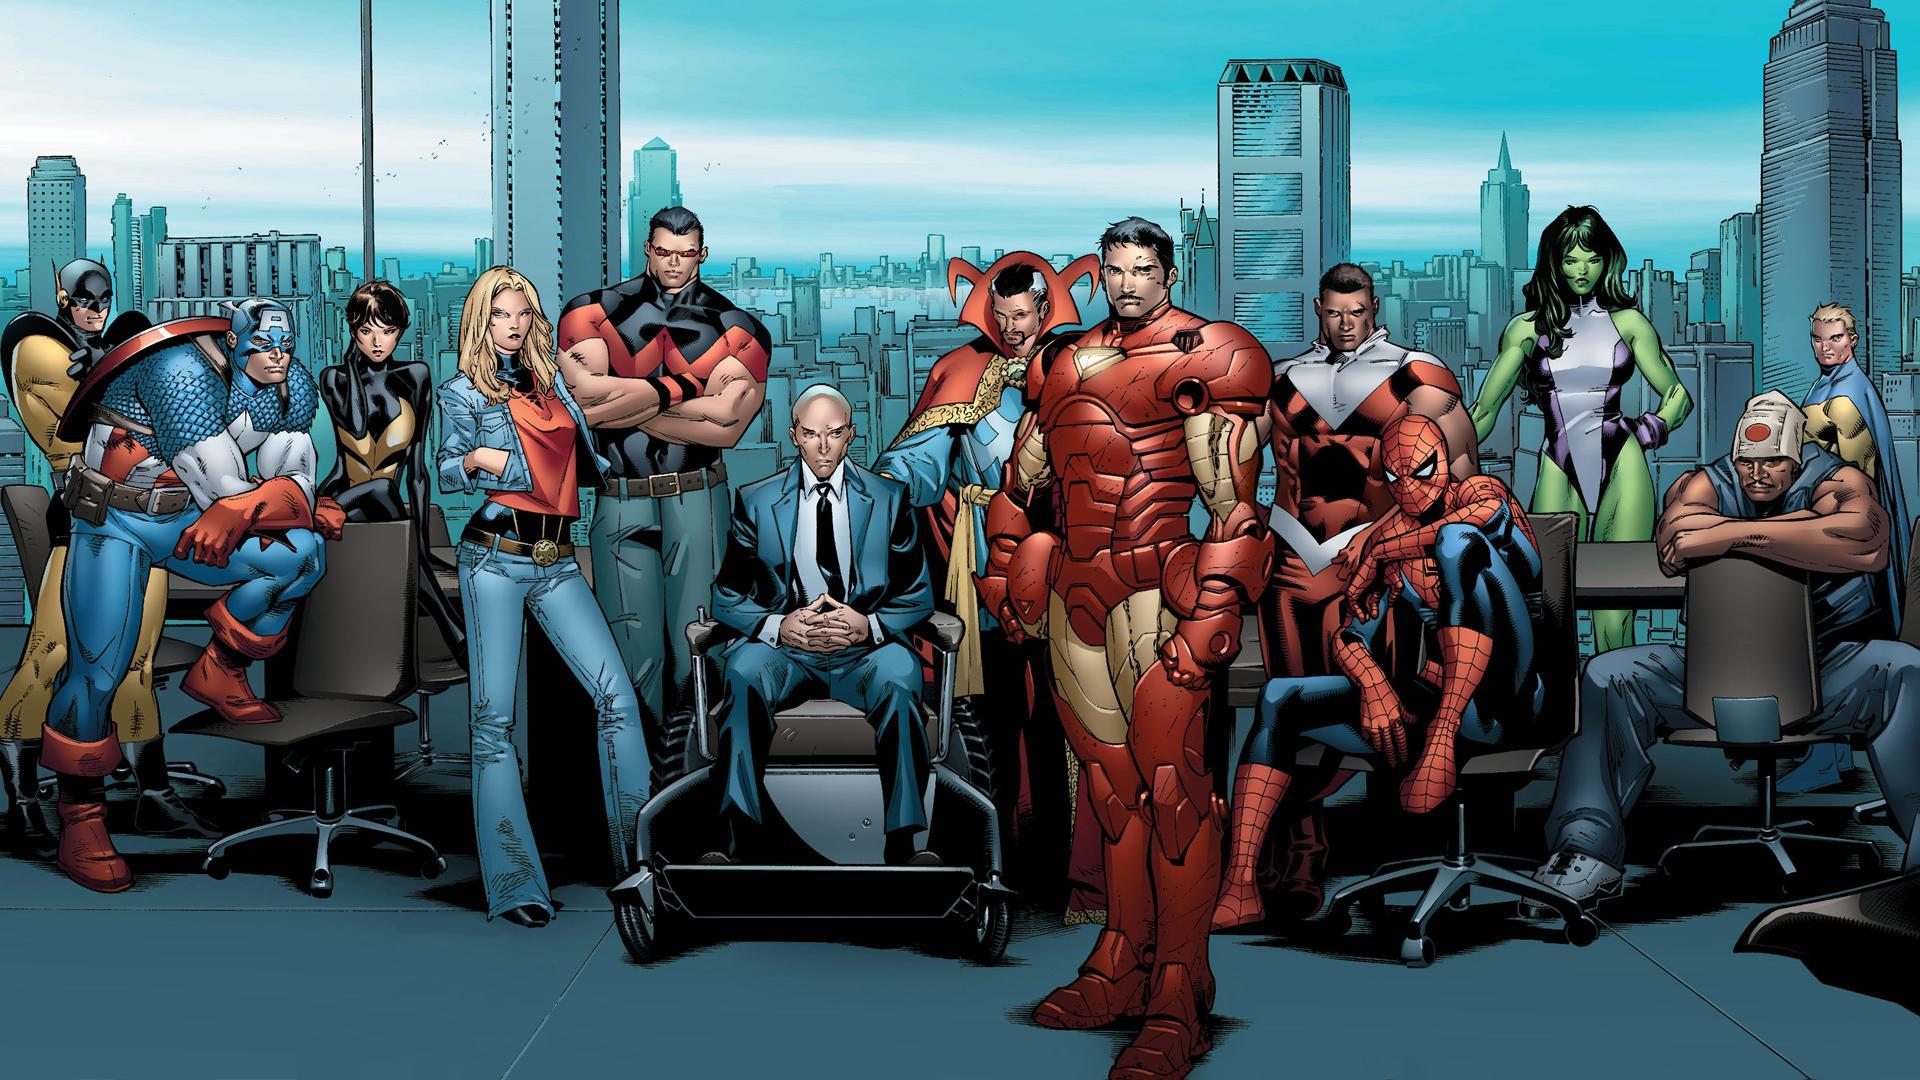 Marvel_day_at_d_office.jpg